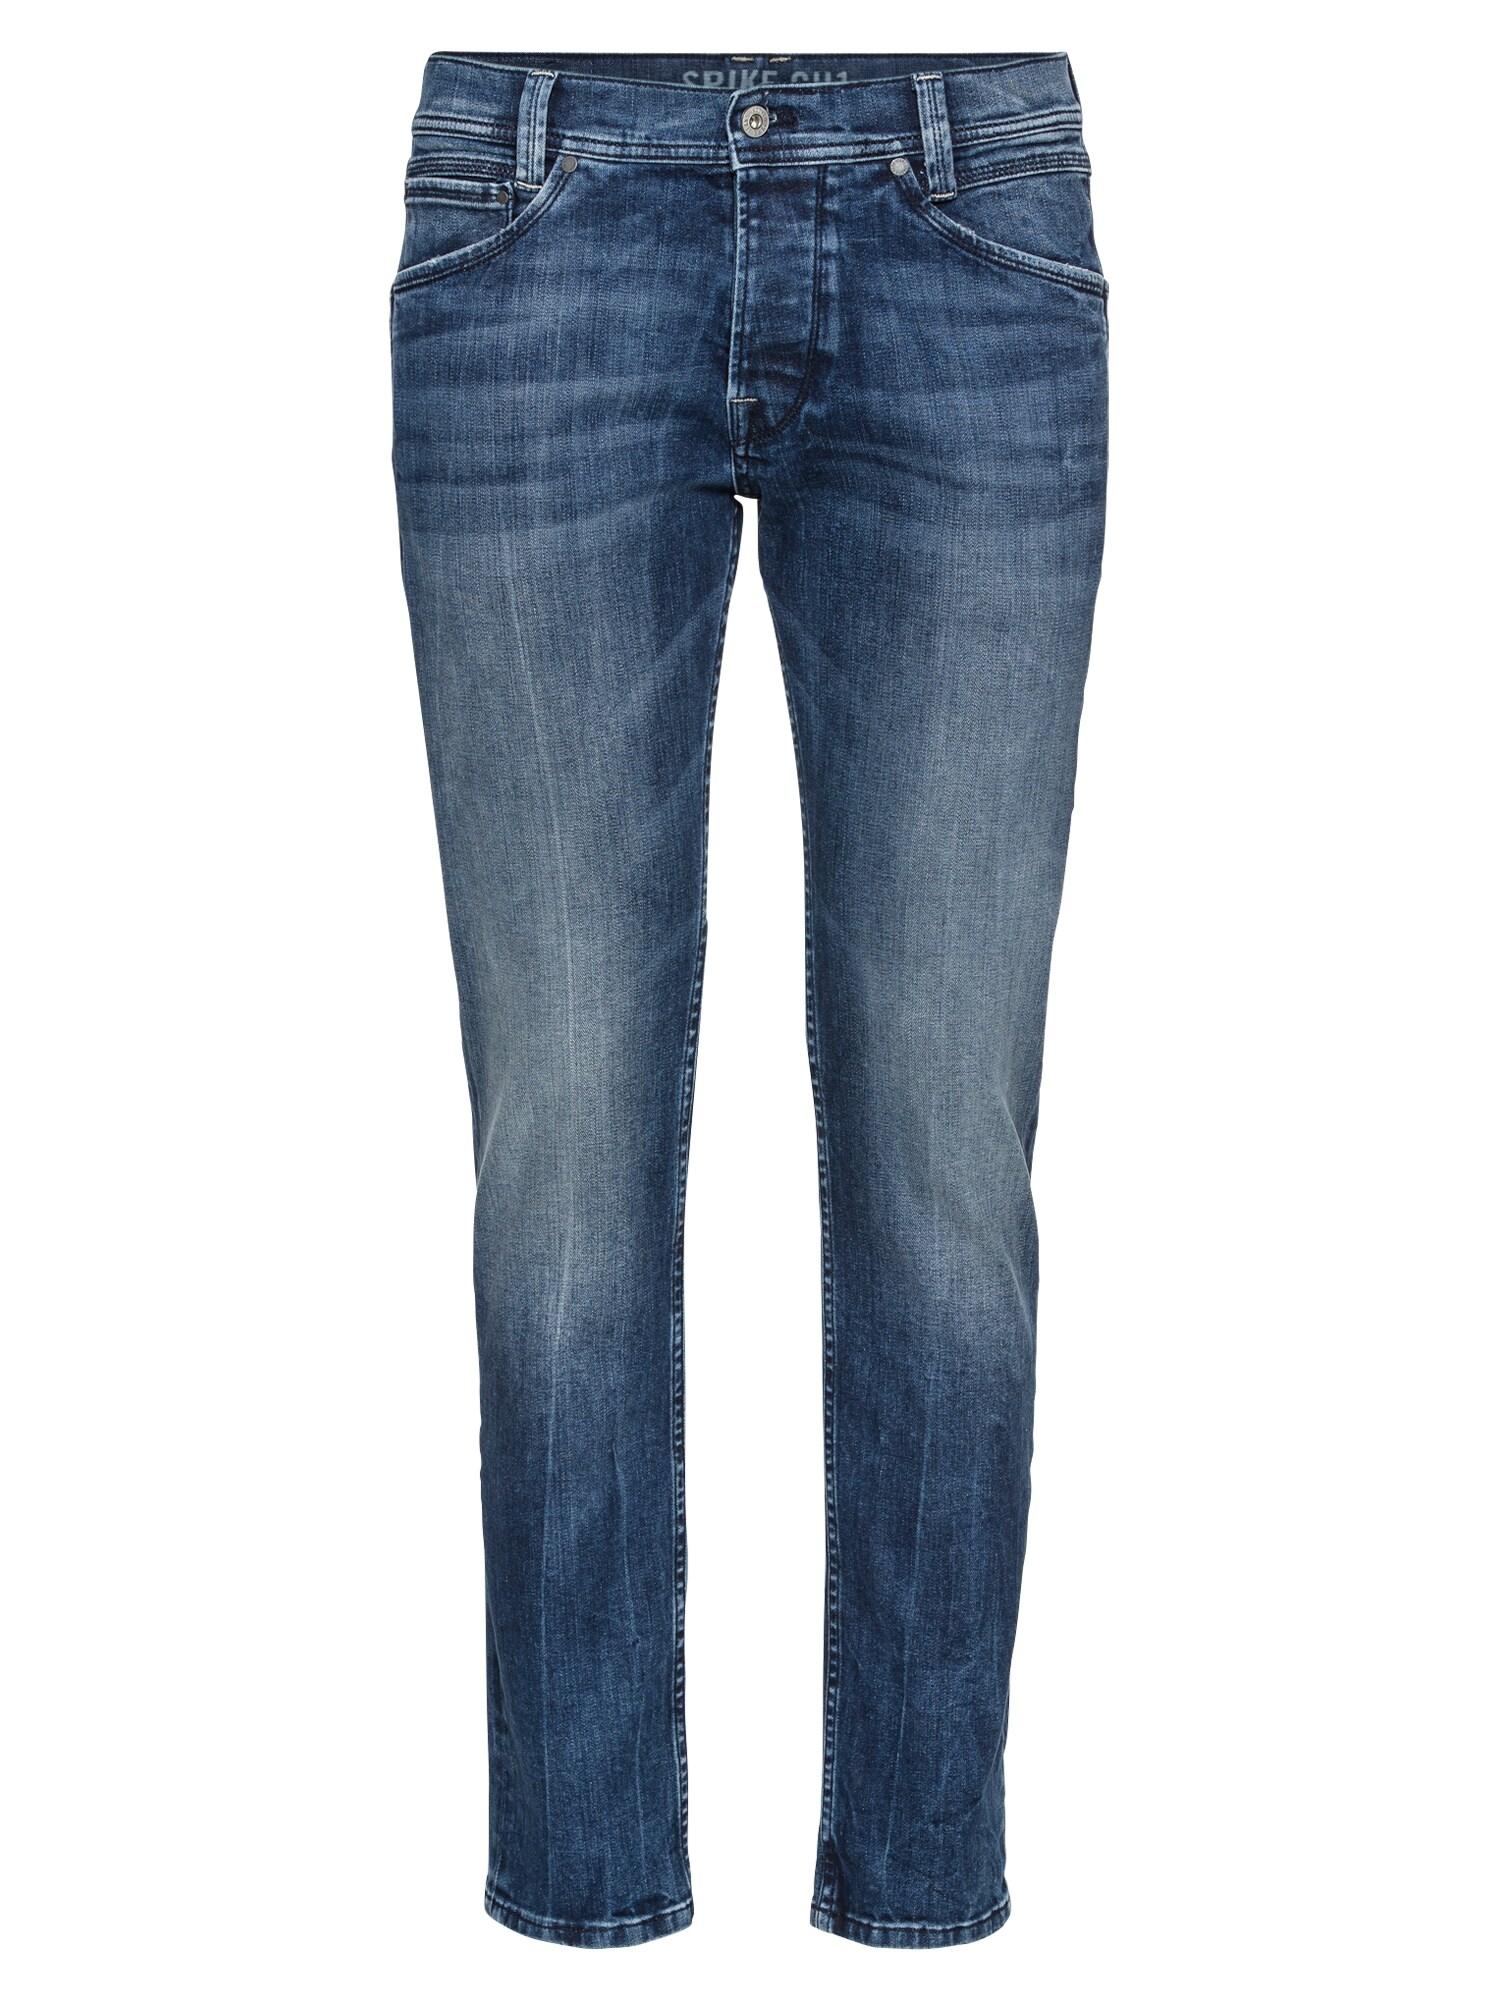 Pepe Jeans Heren Jeans Spike blue denim